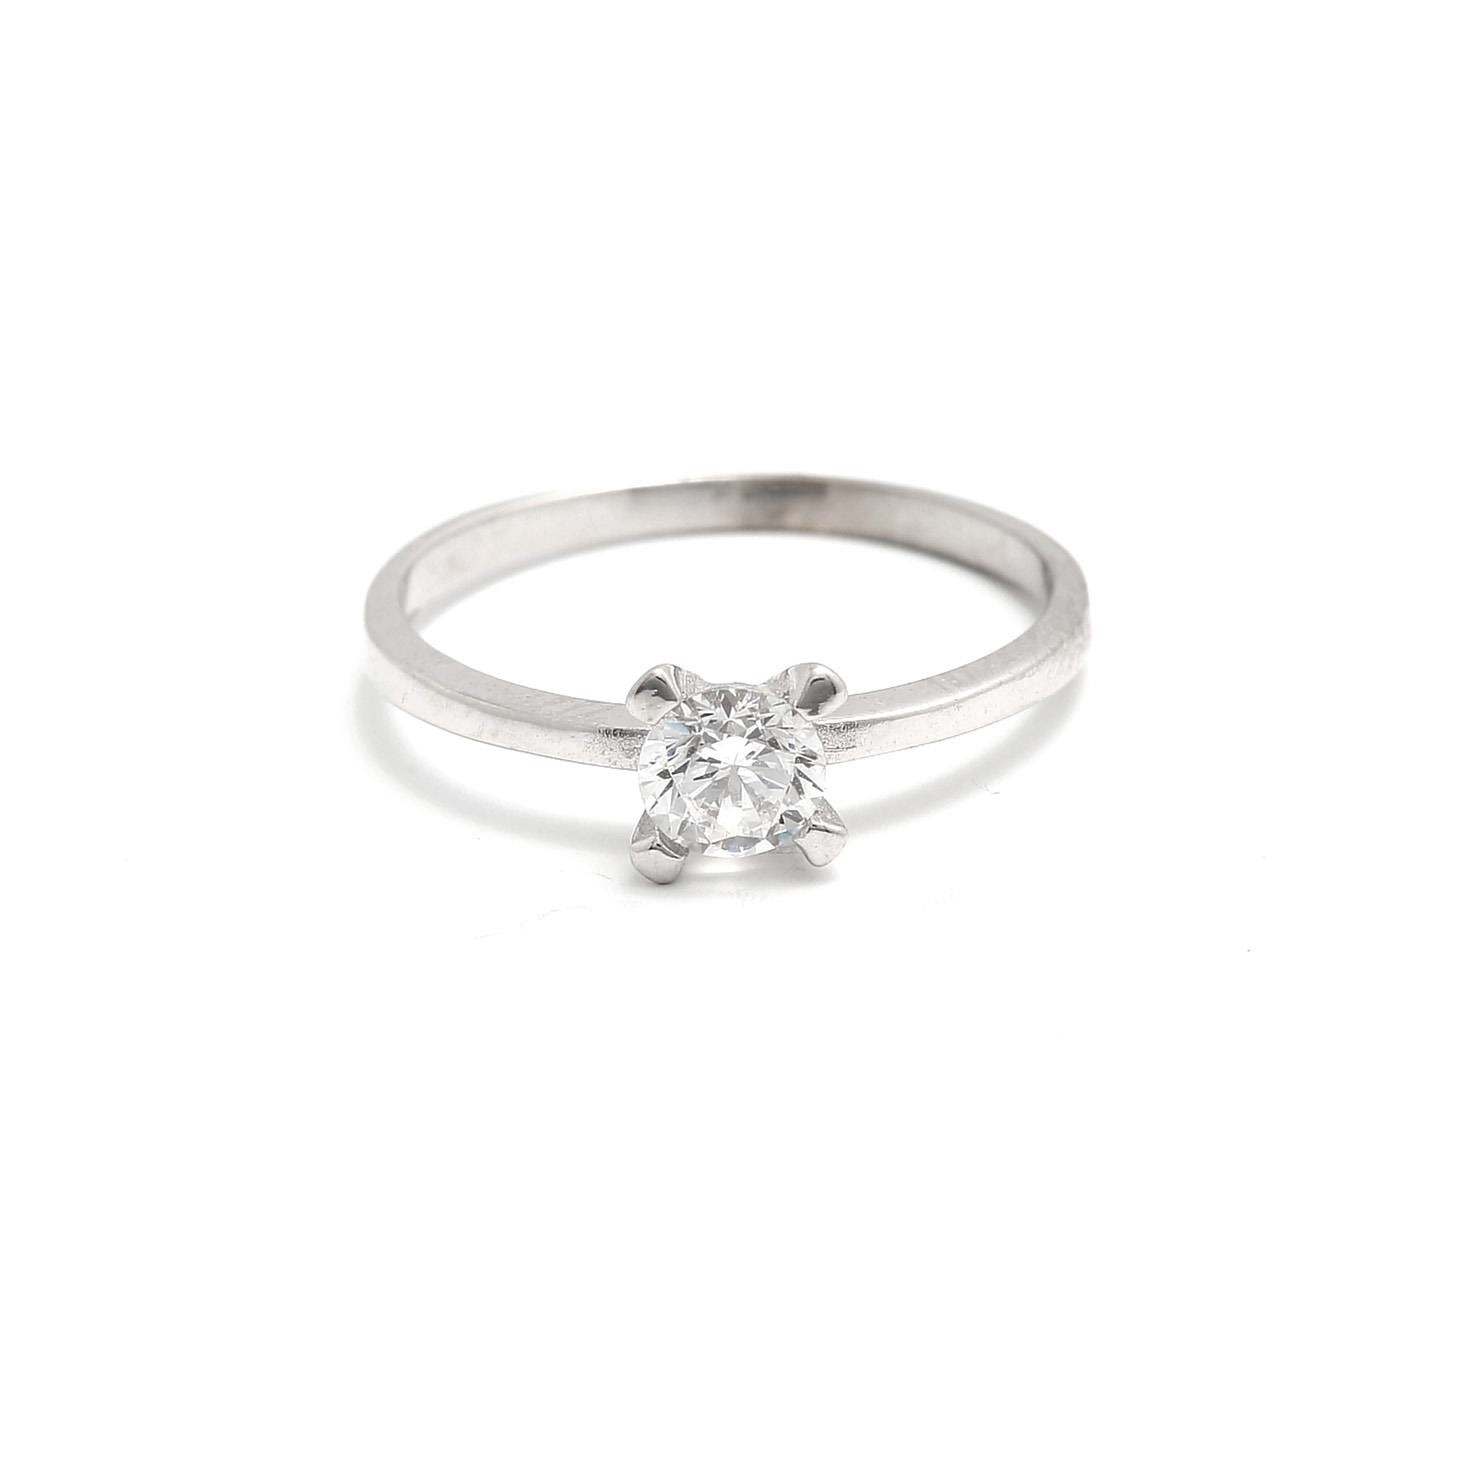 zlatý zásnubný prsteň daisy white zlatý zásnubný prsteň daisy white 1 ... 82ef56ec393